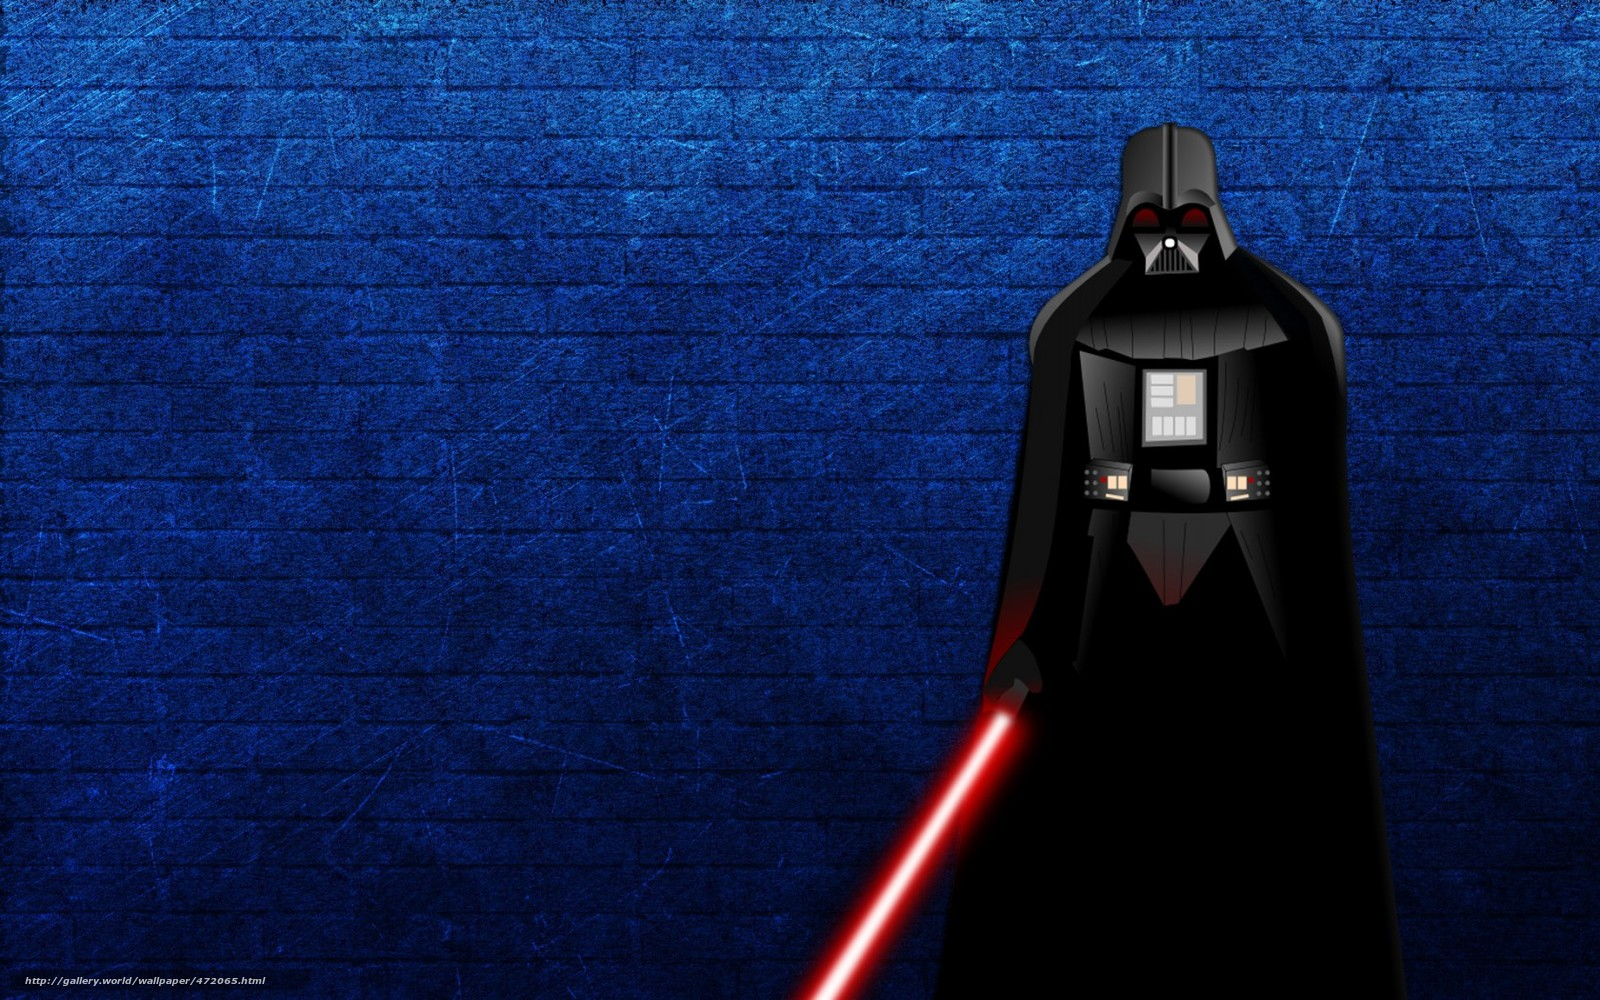 Scaricare Gli Sfondi Star Wars Darth Vader Spada Laser Sfondo Blu